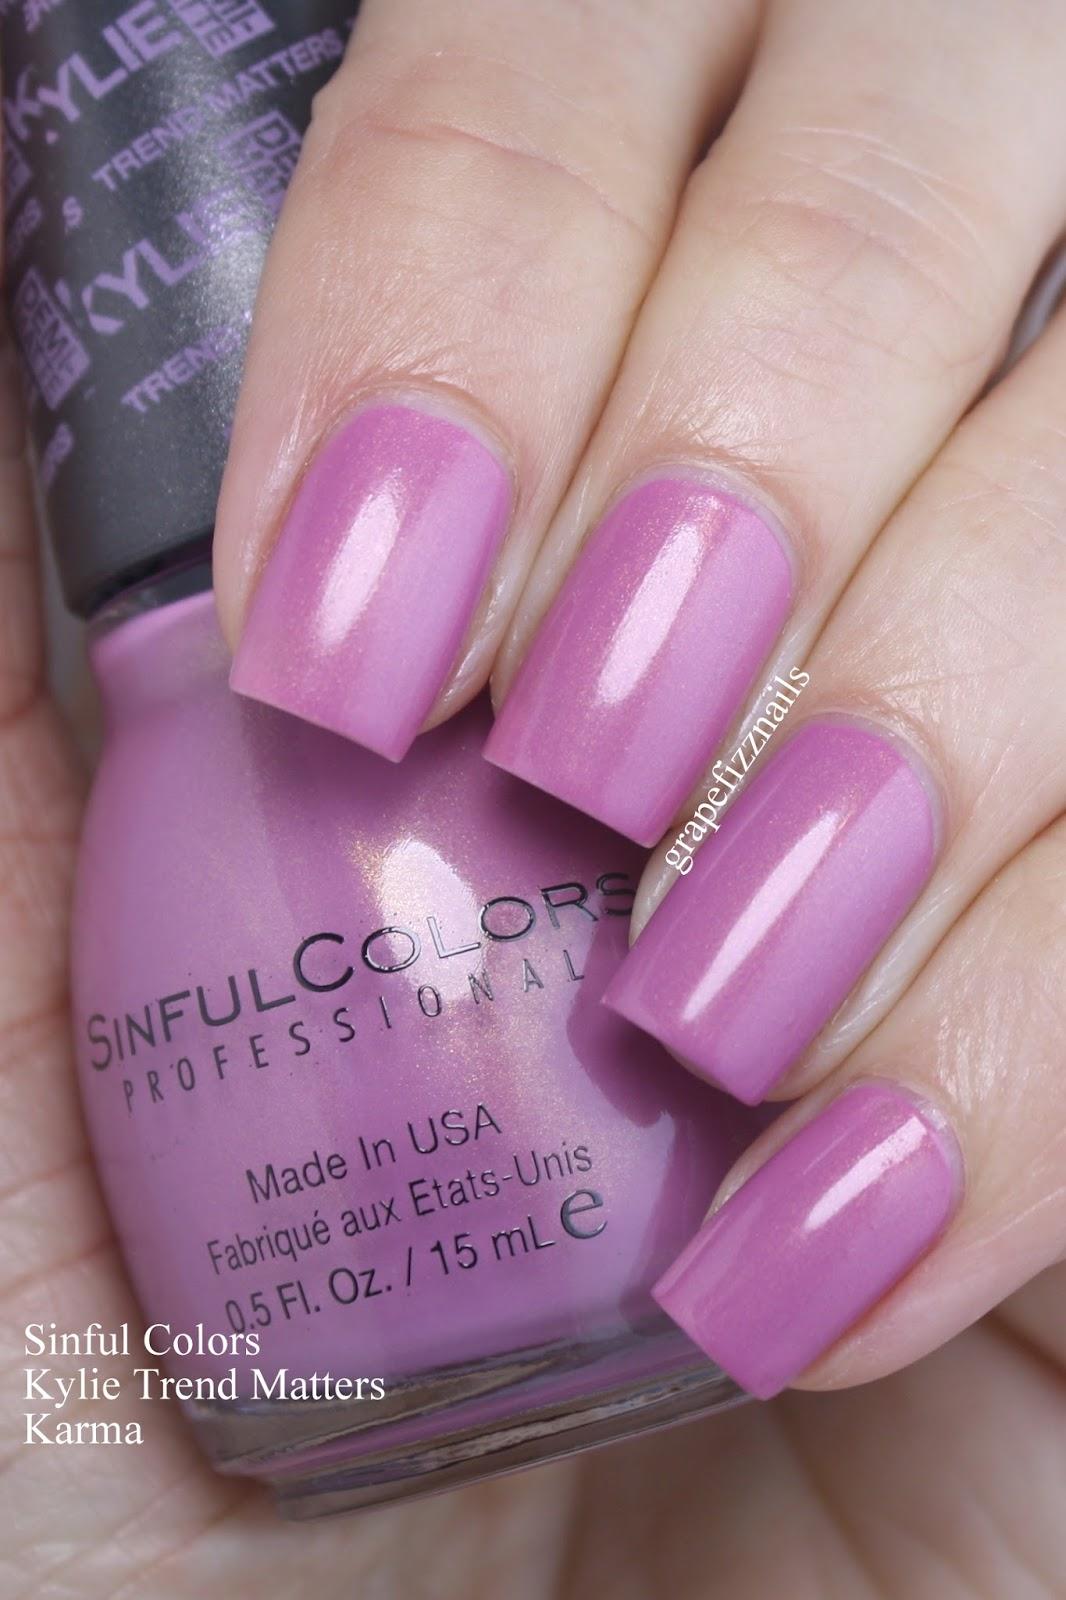 Grape Fizz Nails: Sinful Colors Kylie Trend Matters